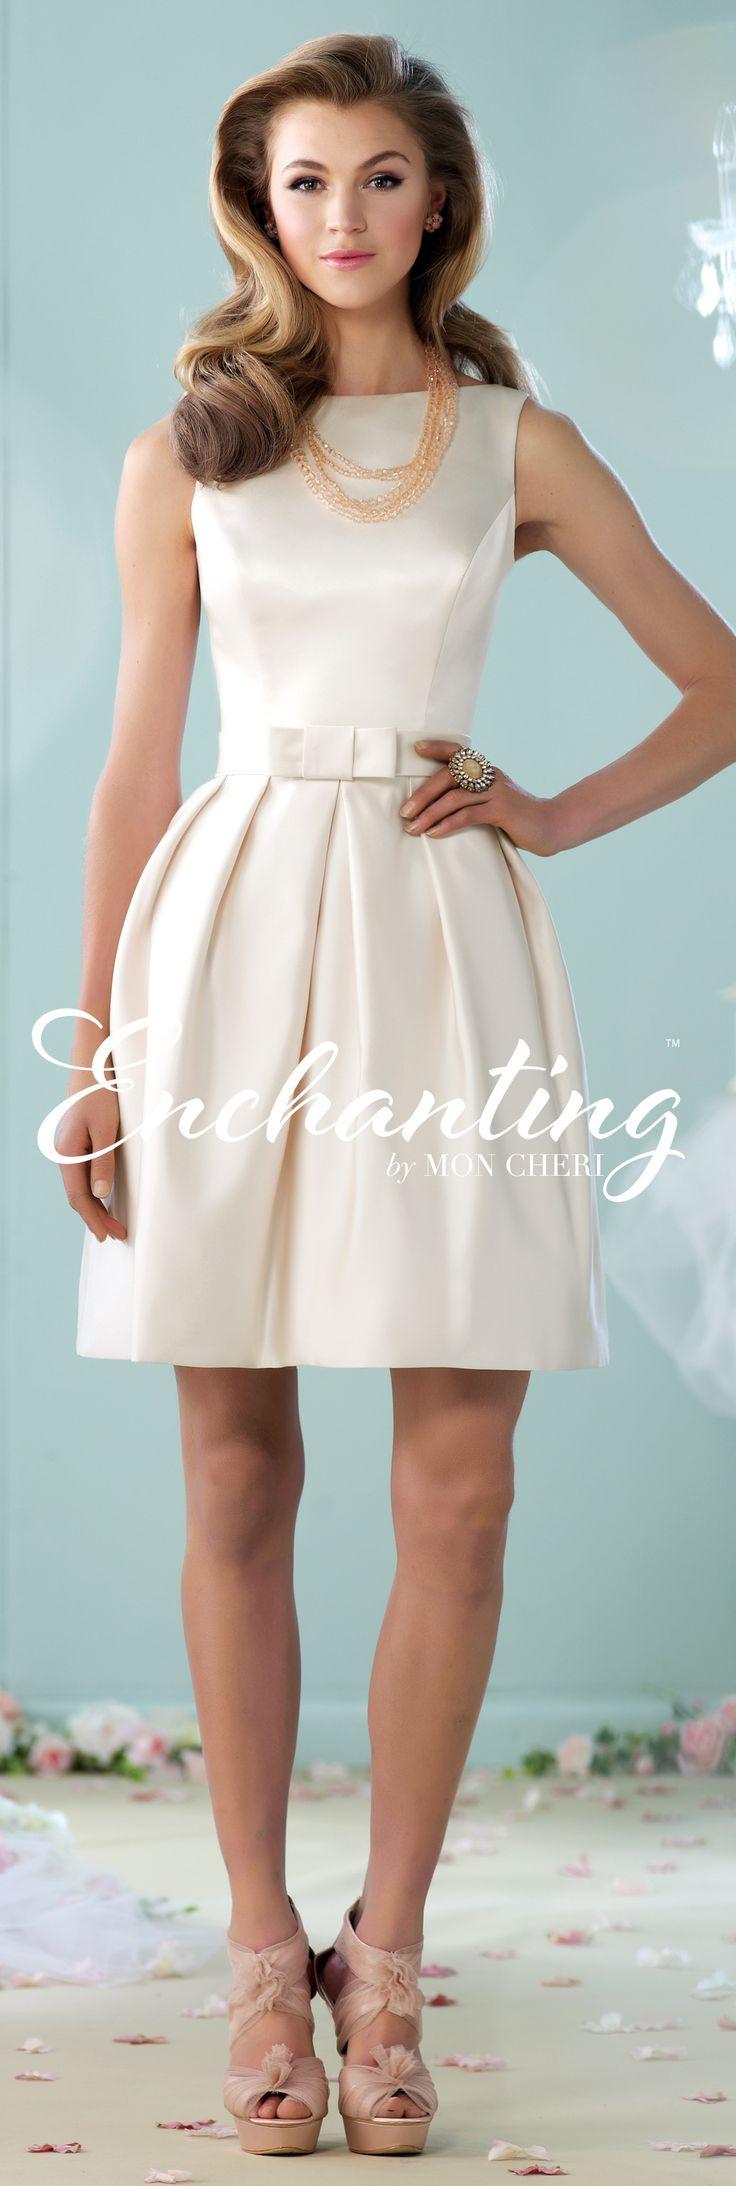 Enchanting by Mon Cheri - The Premiere Collection ~Style No. 215109 #shortweddingdresses